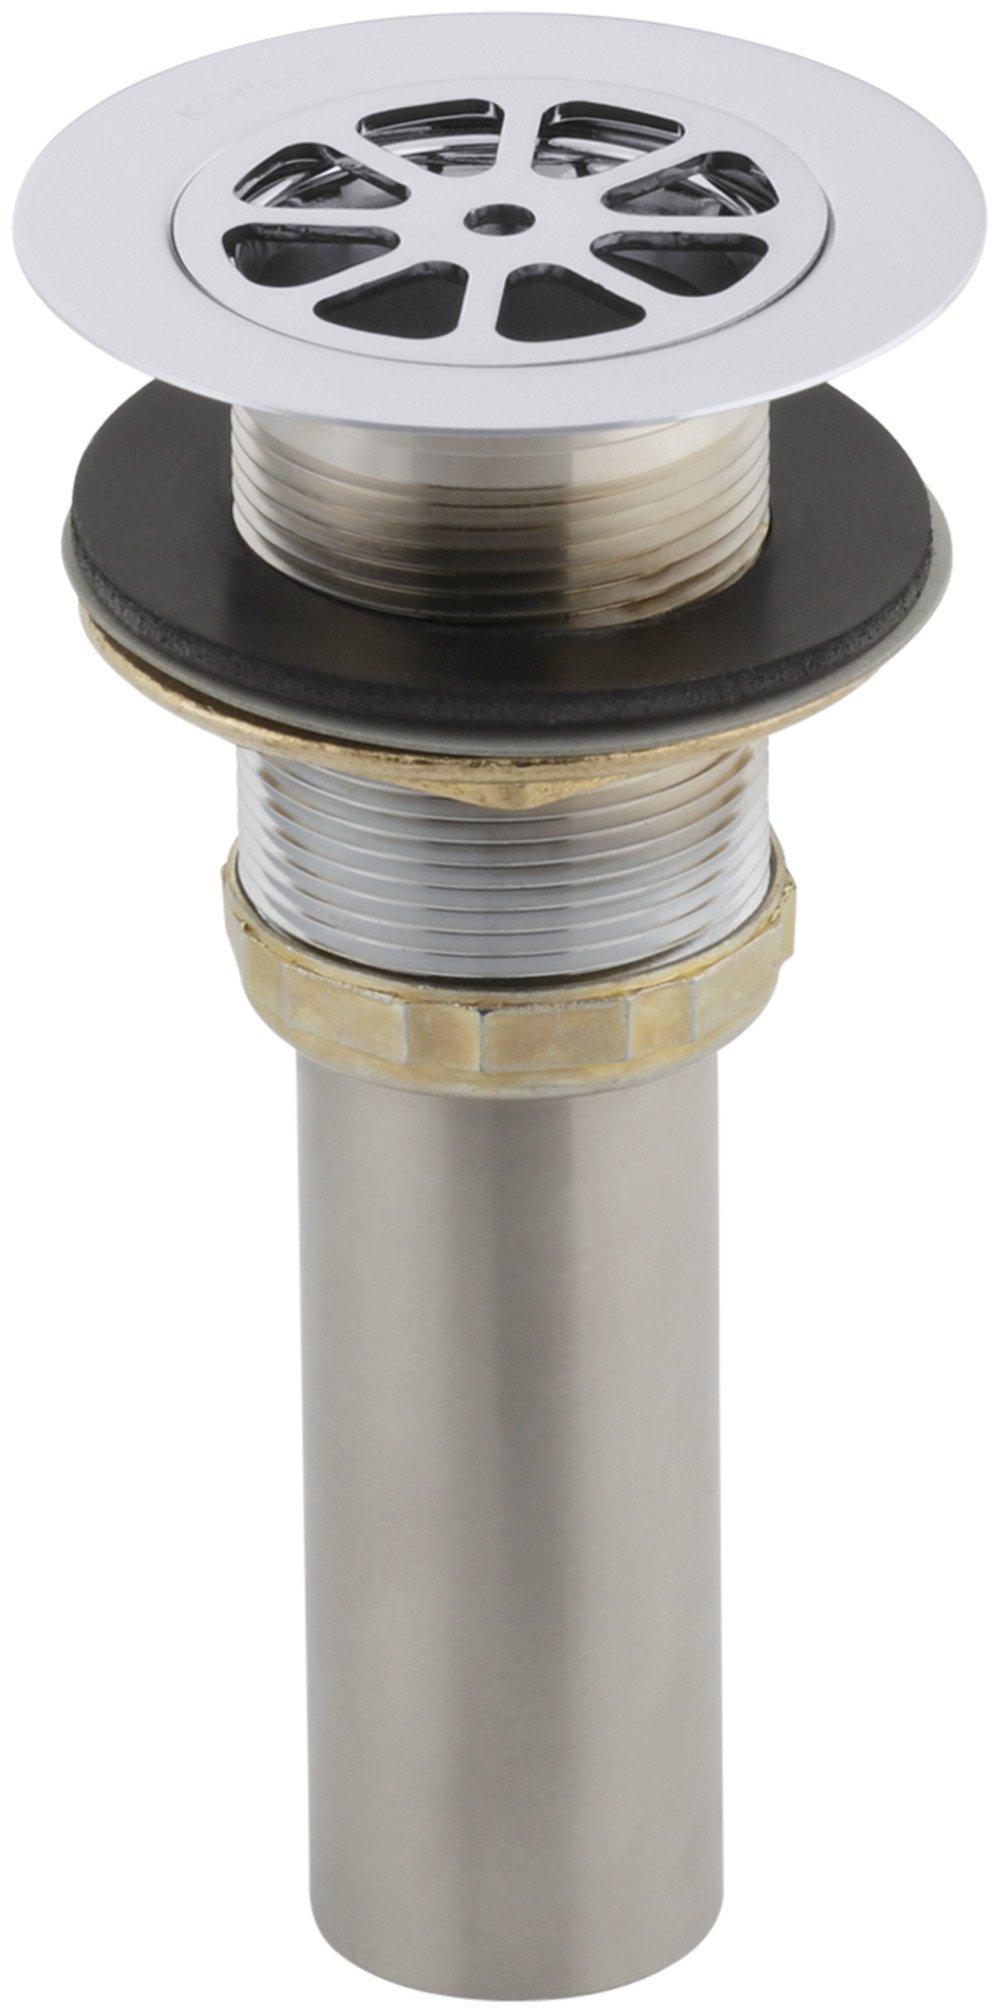 KOHLER 9115-CP Sink Strainer